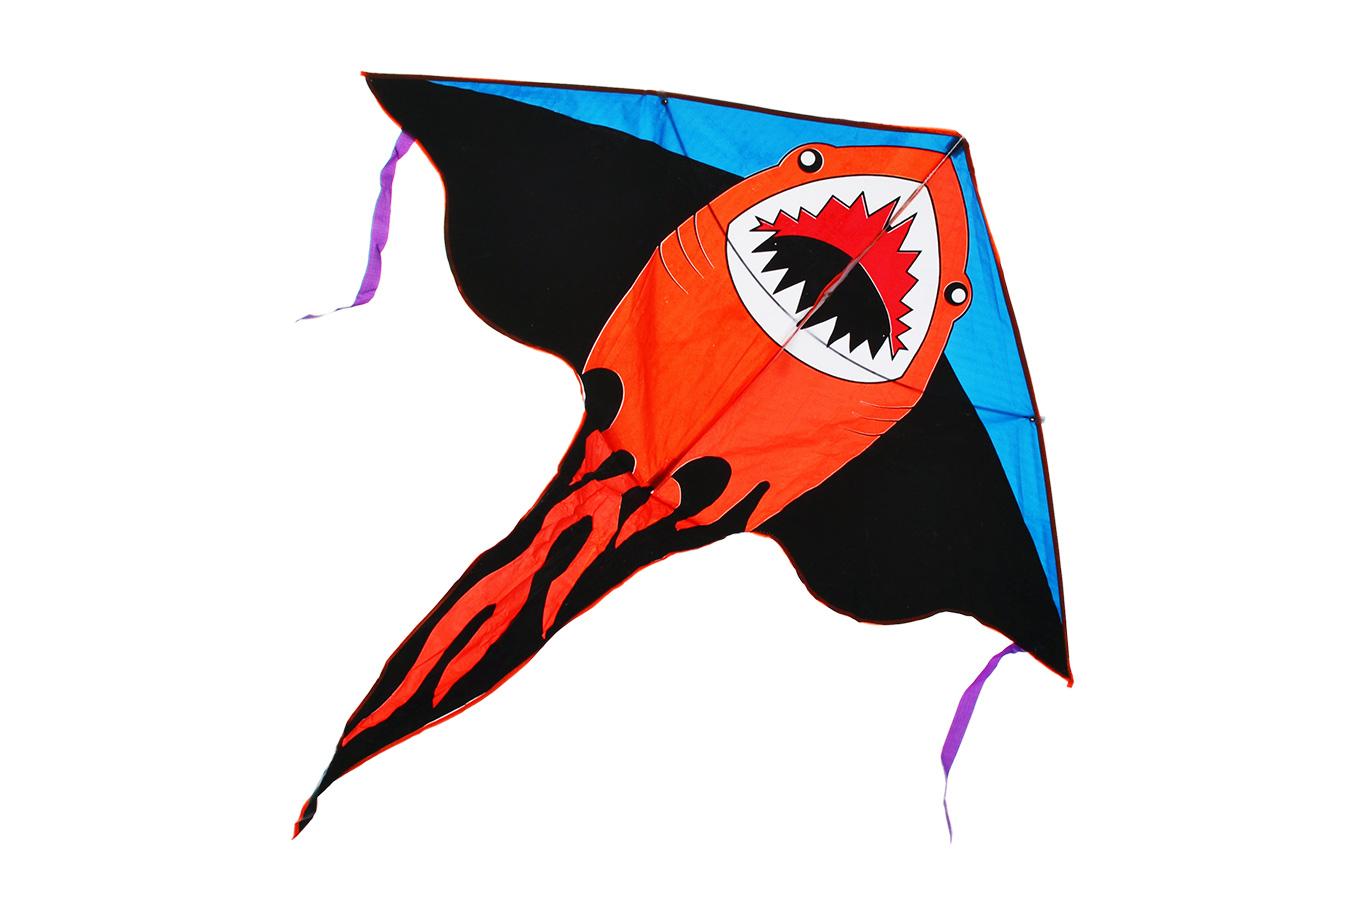 Лисья акула, воздушный змей [ZBTK0144]